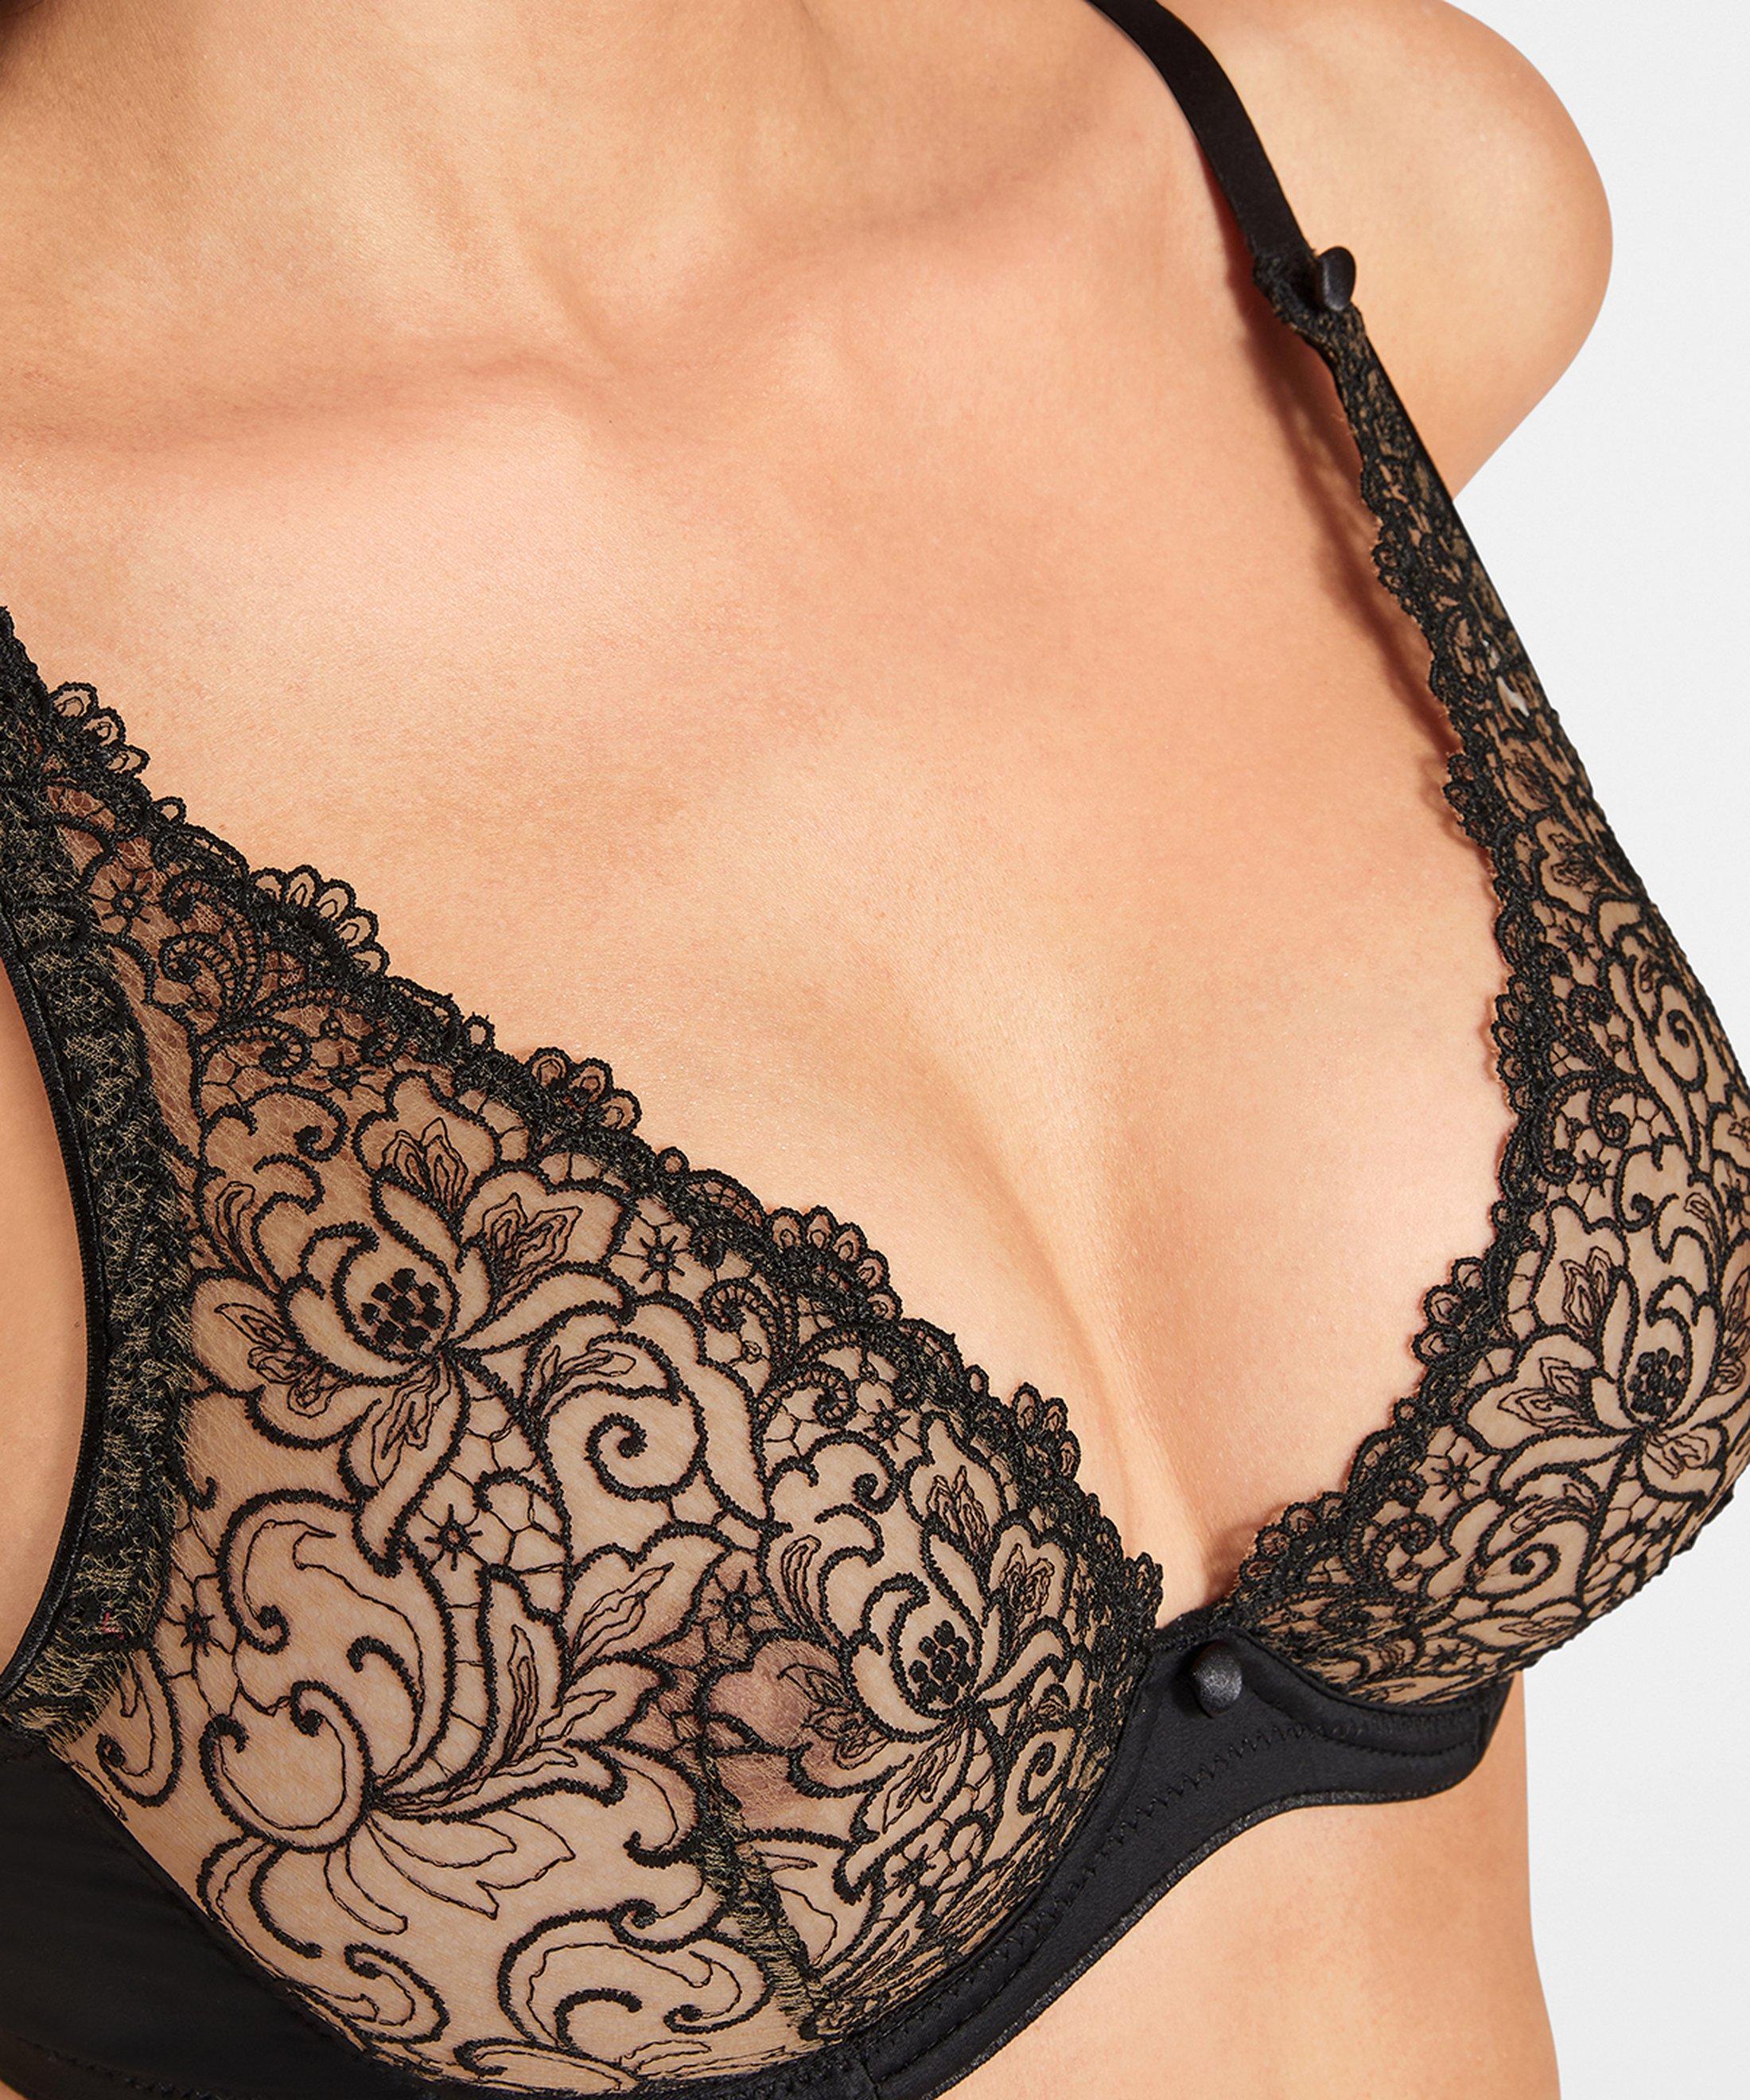 KARL LAGERFELD X AUBADE Triangle bra - up to F cup Black Tuxedo | Aubade